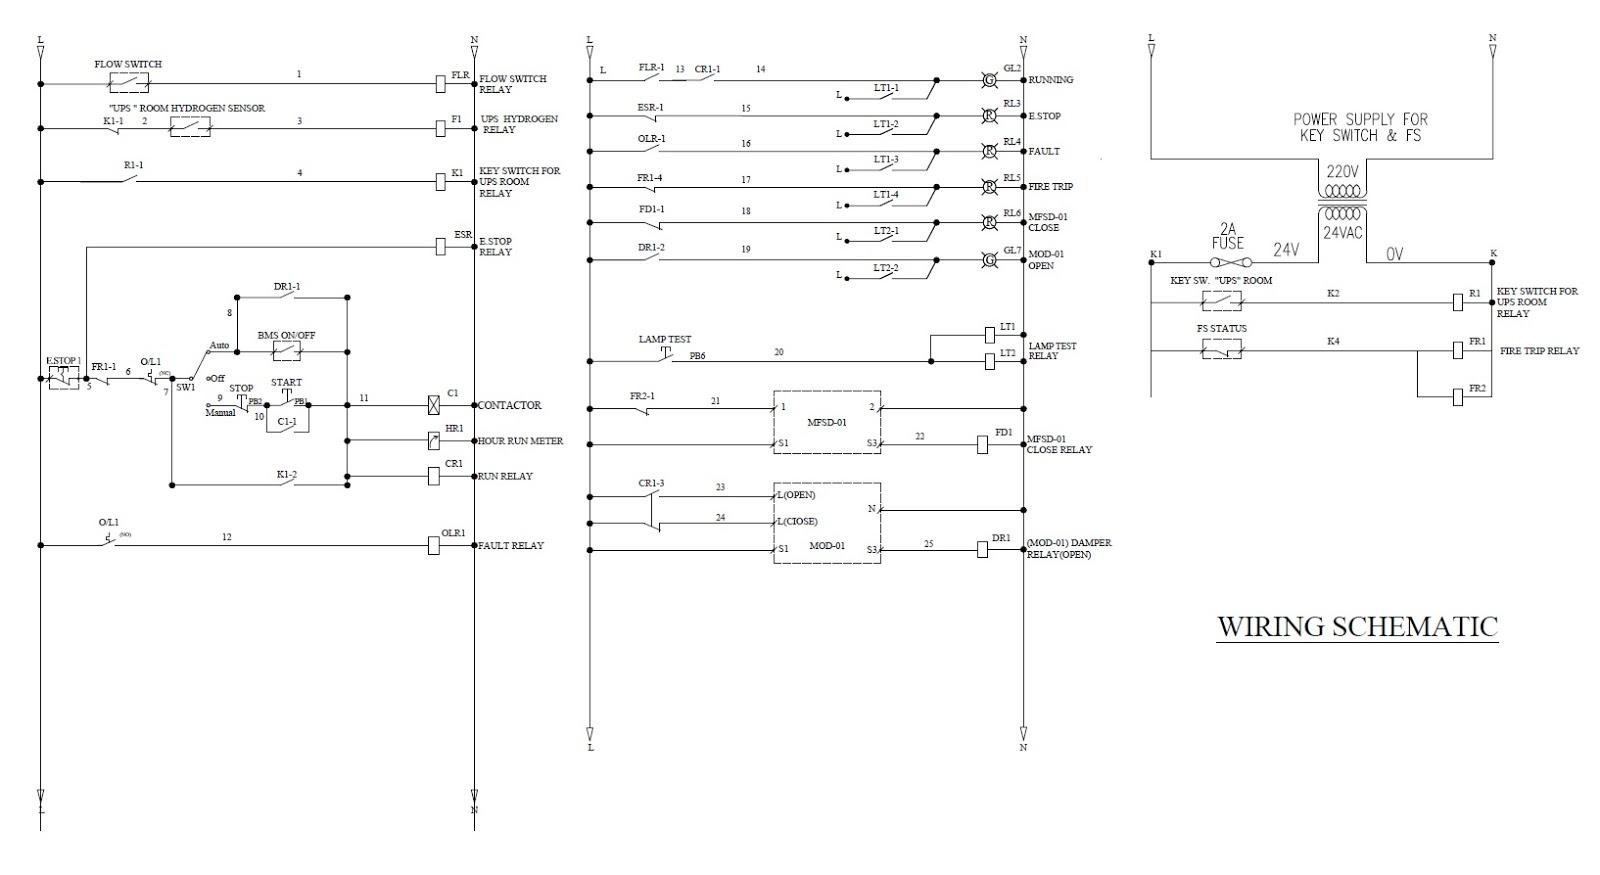 13 Terminal Meter Socket Wiring Diagram Central Boiler Thermostat 5 Form 16s